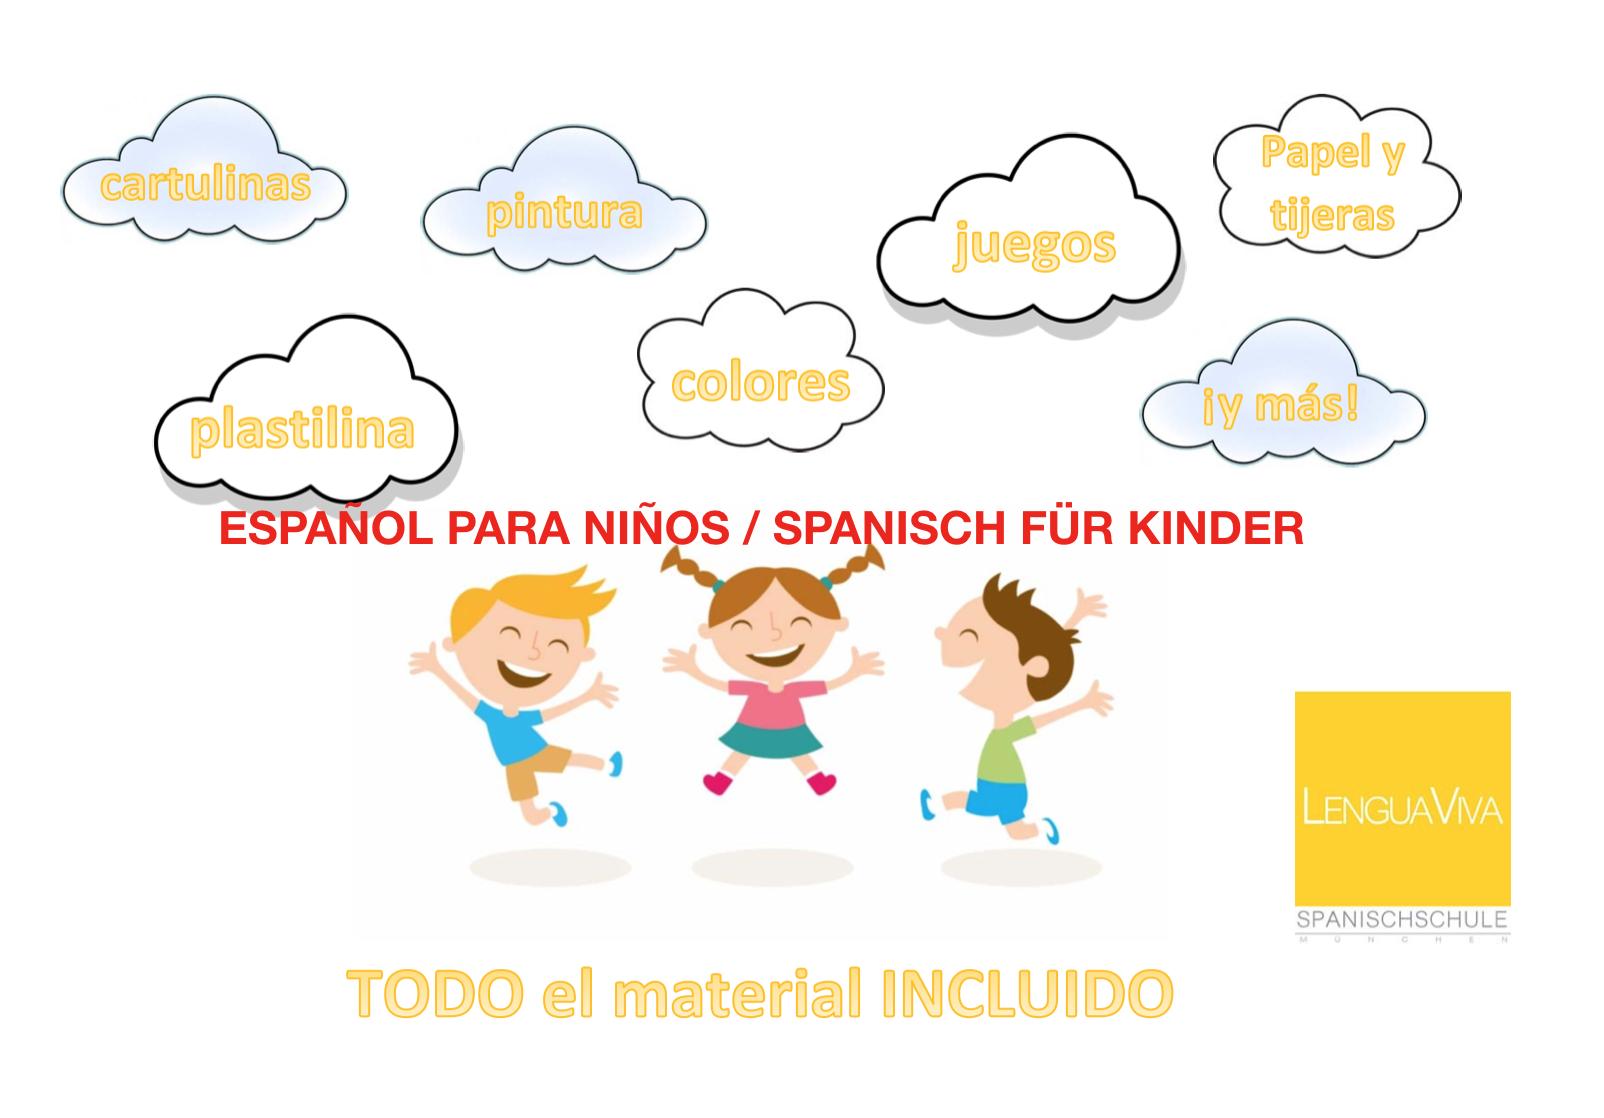 Spanisch für Kinder español para niños